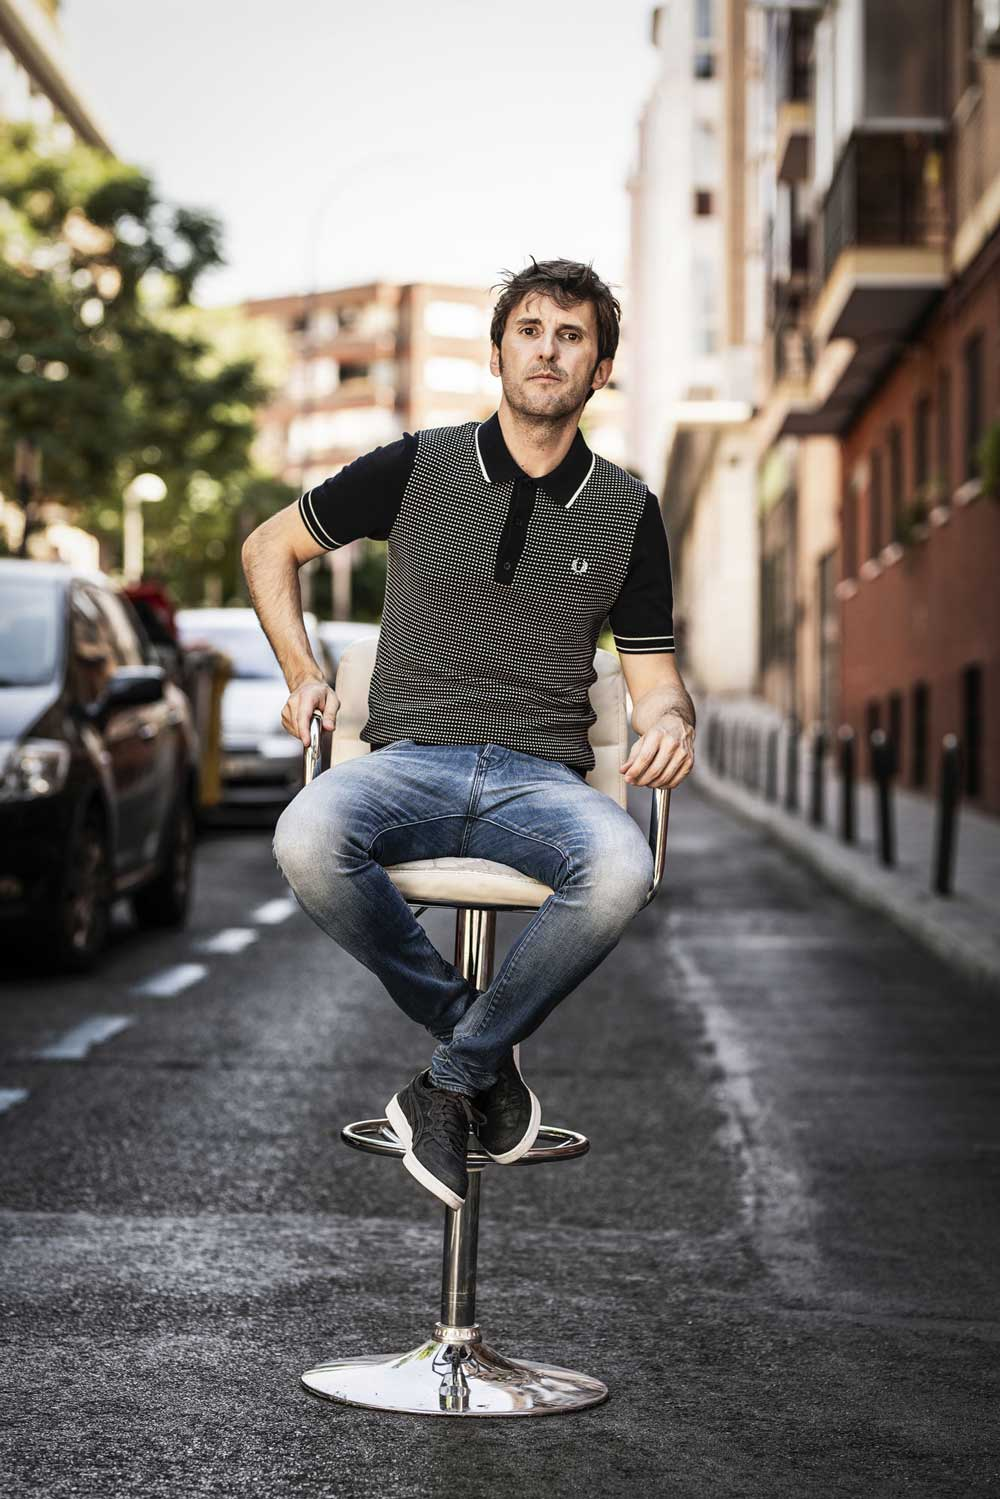 julian-lopez-actor-fotos